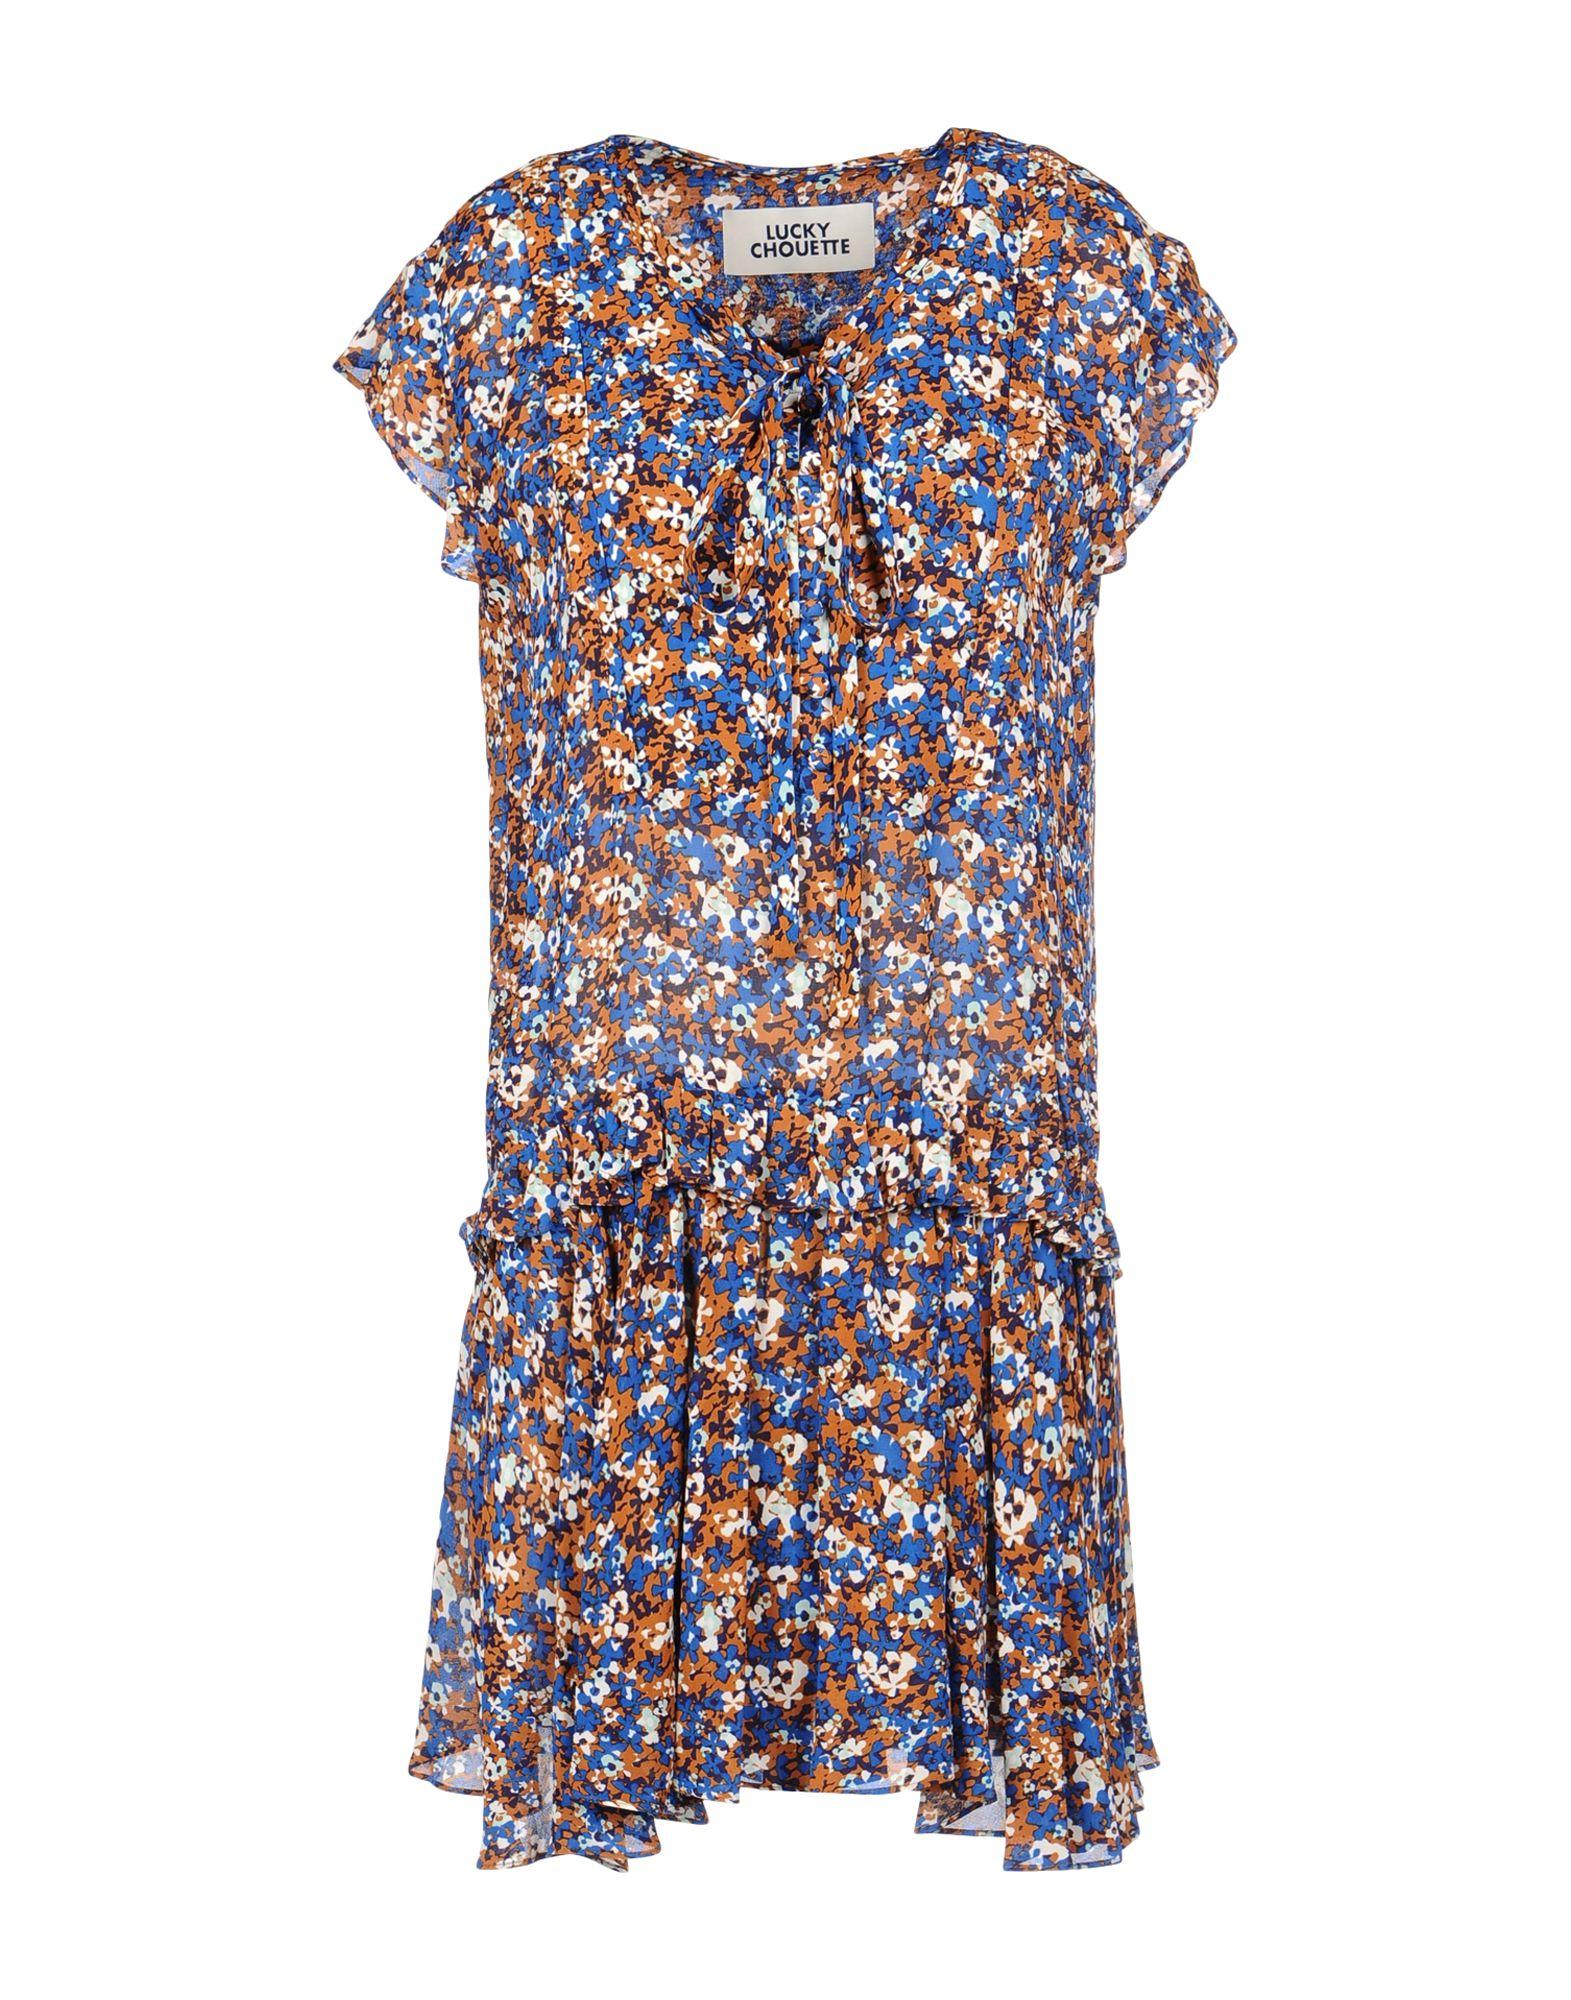 LUCKY CHOUETTE Платье до колена платье lucky move lucky move mp002xw0e1zw